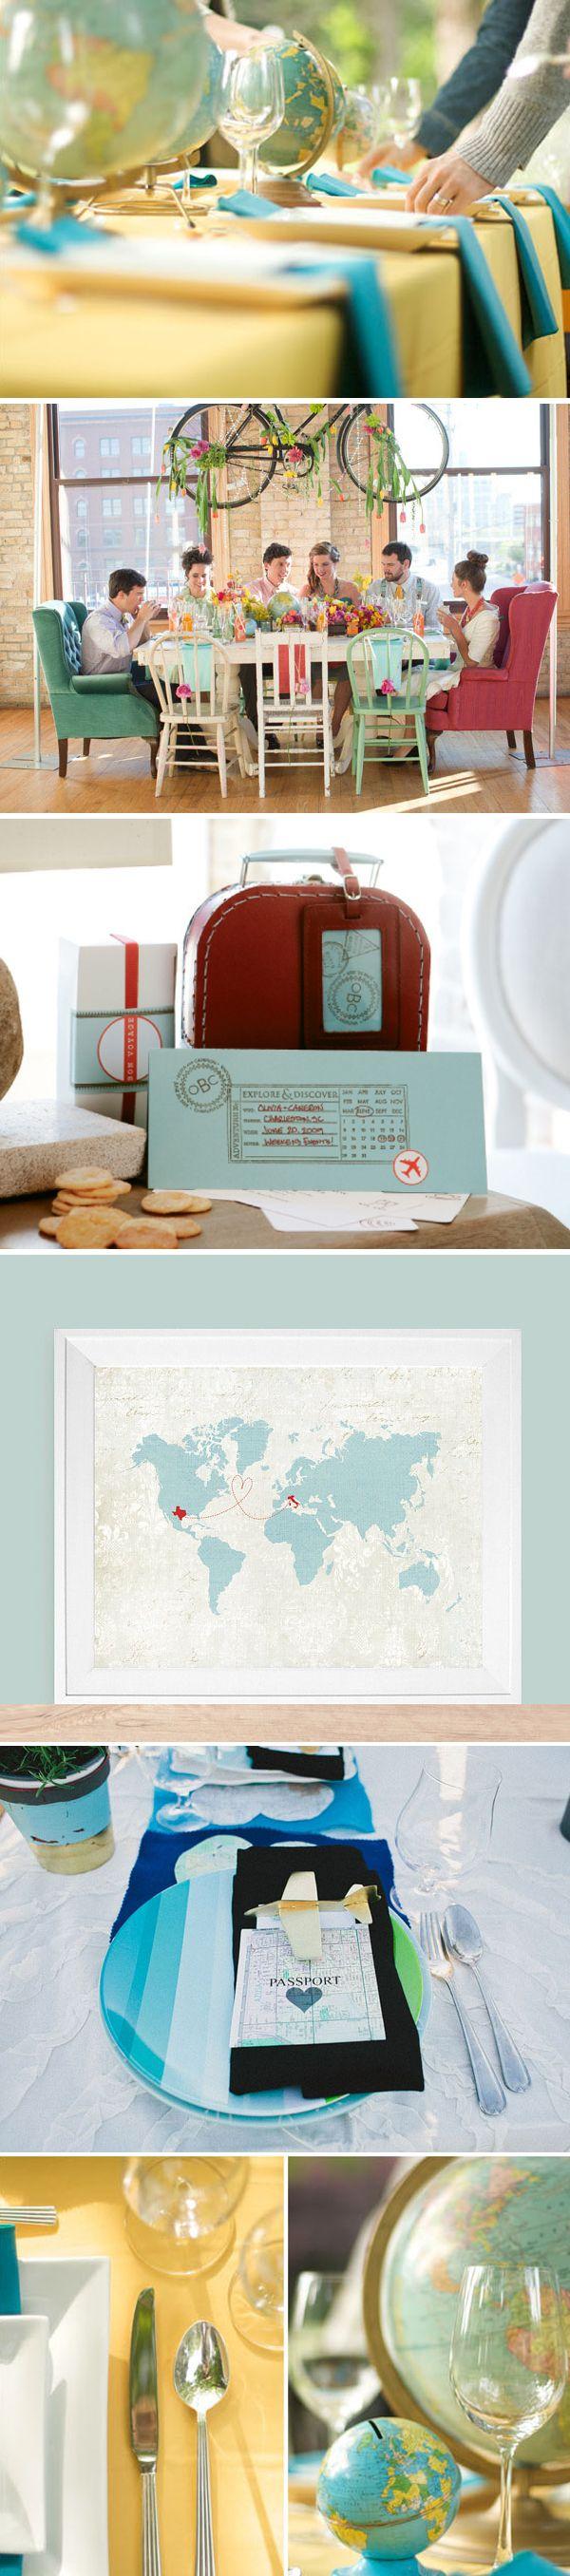 Praise Wedding » Wedding Inspiration and Planning » Travel-Themed Weddings & Holiday Notice